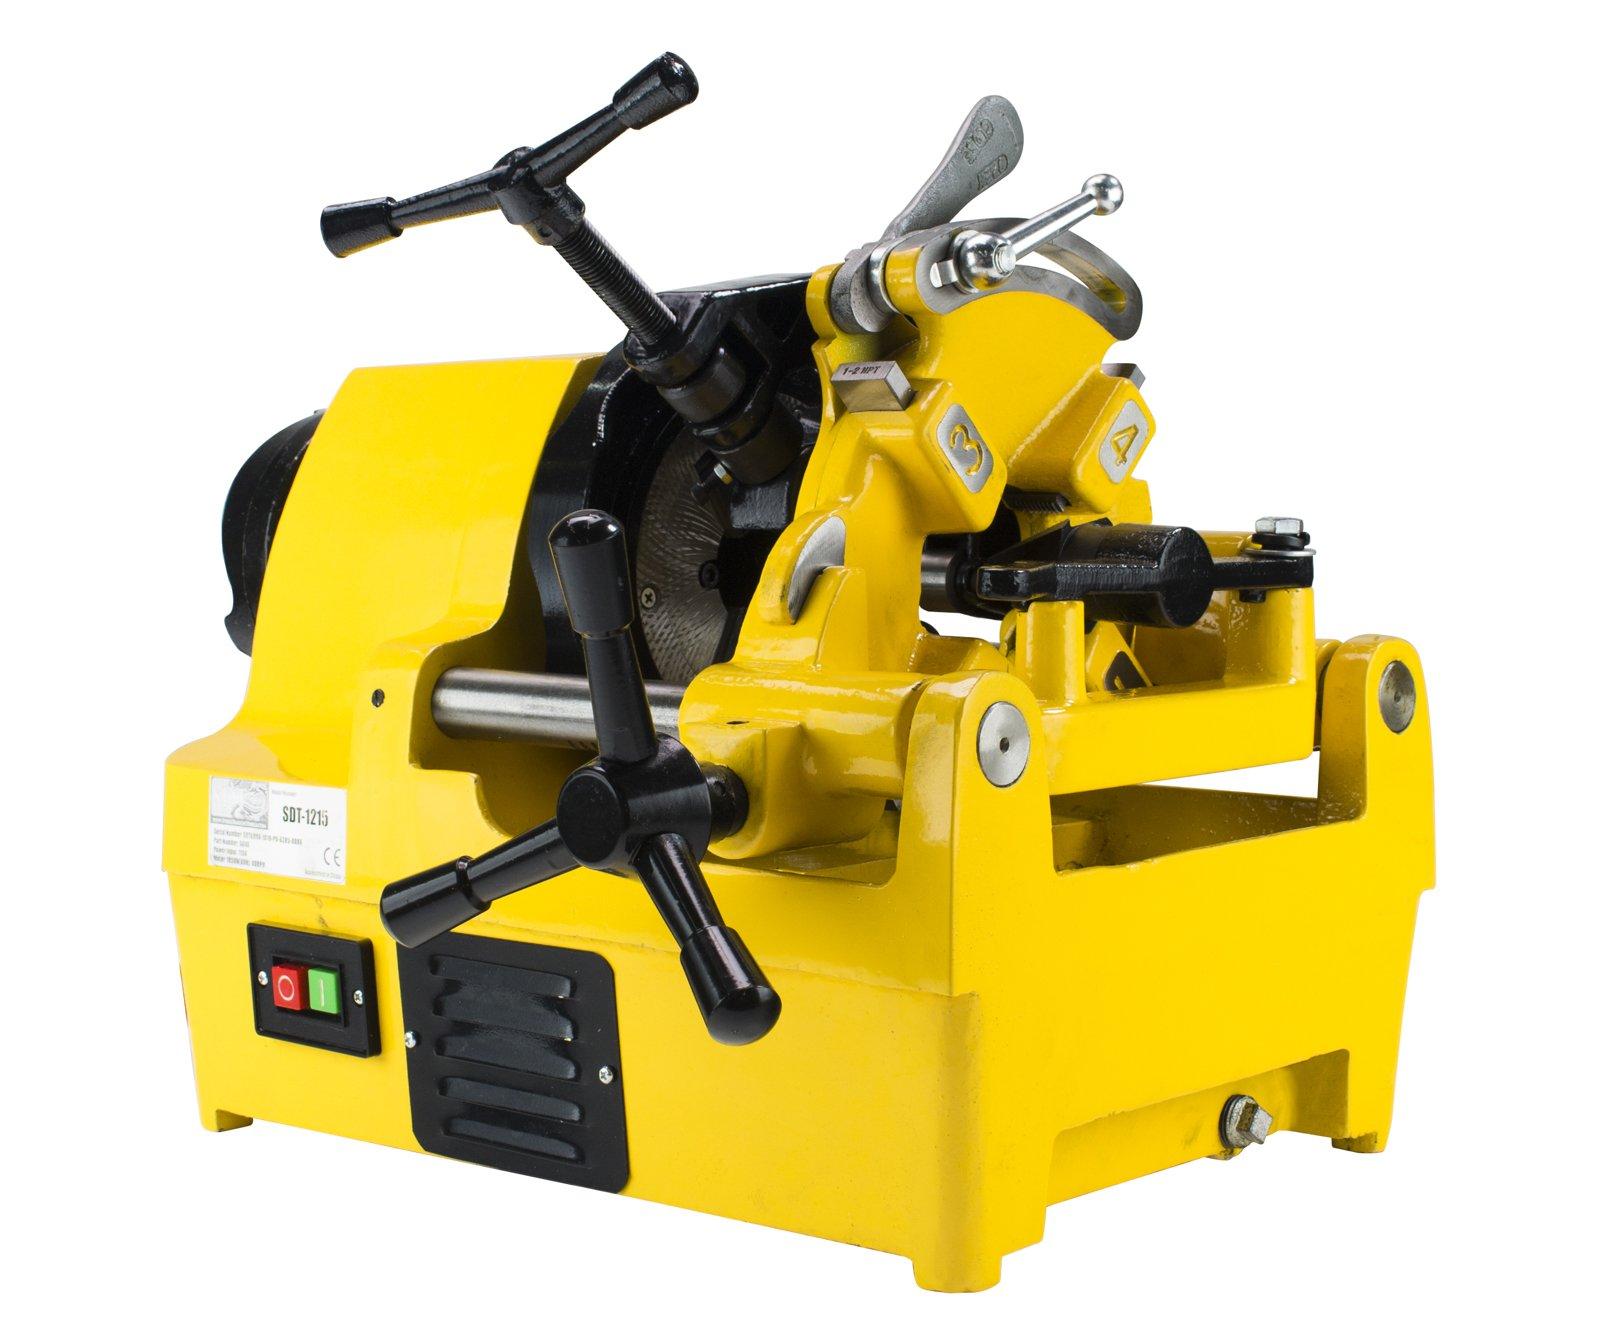 Steel Dragon Tools 1215 1-1/2'' Power Pipe Threader Threading Machine with 811A Self Oiling Die Head fits RIDGID 47770 47765 47745 47750 Dies